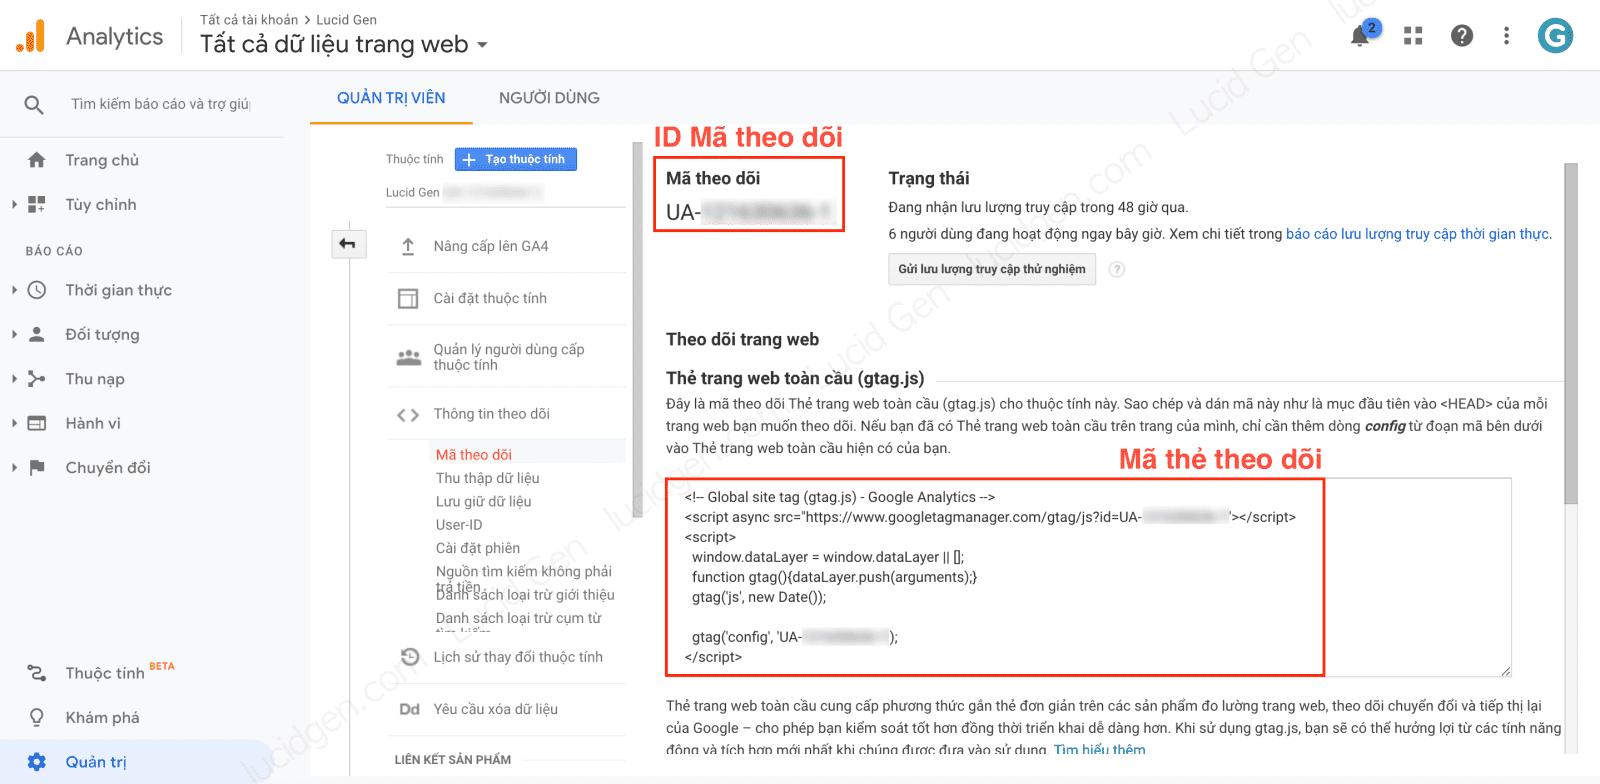 How to add Google Analytics to website Universal - Get the old version Google Analytics code